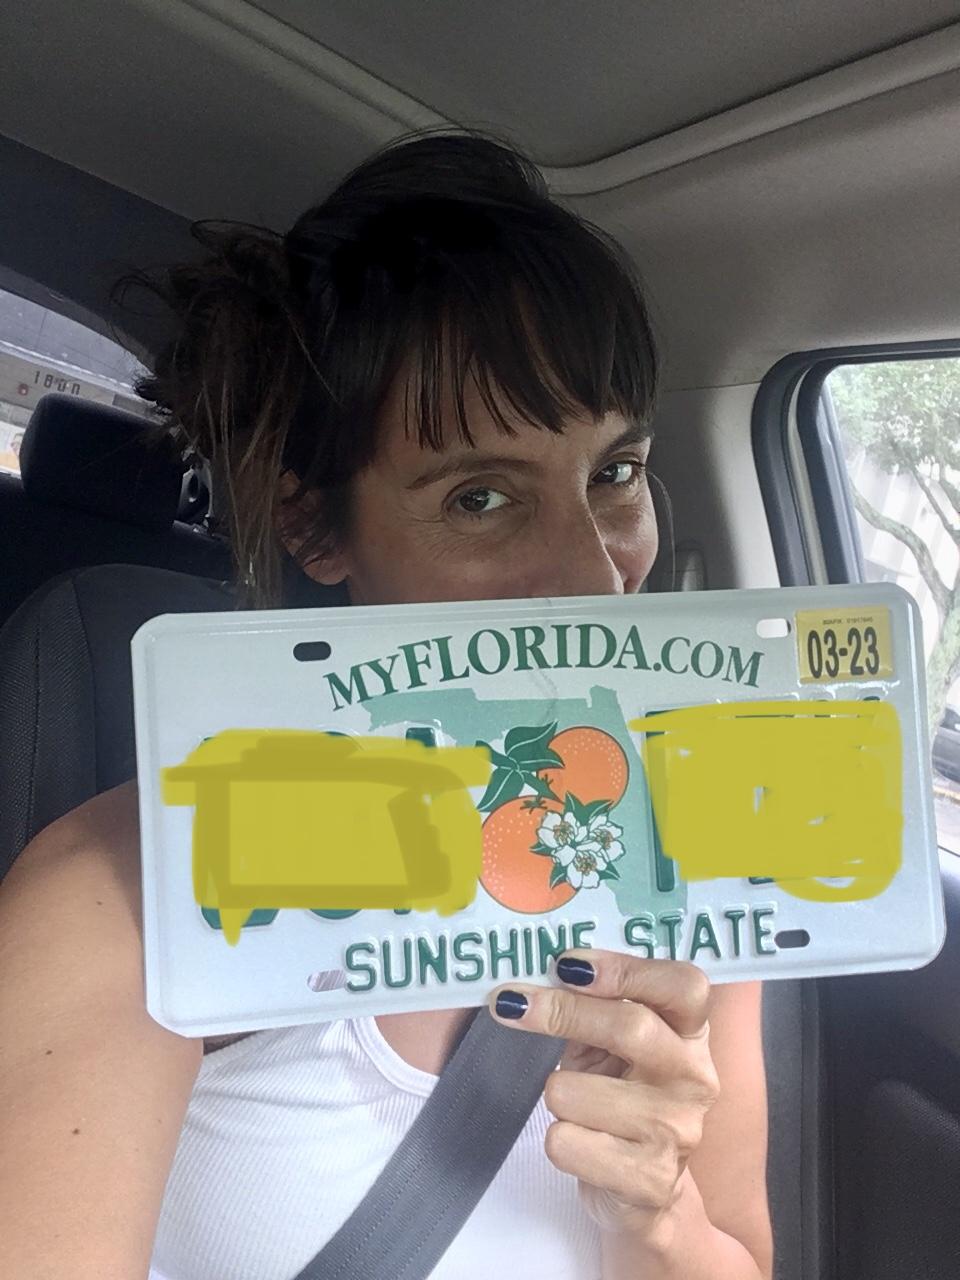 = oy FLORIDA.C M 032  = / x ne ASH \ pT  © LSUNSHINGSIATE= = EY      = -  al